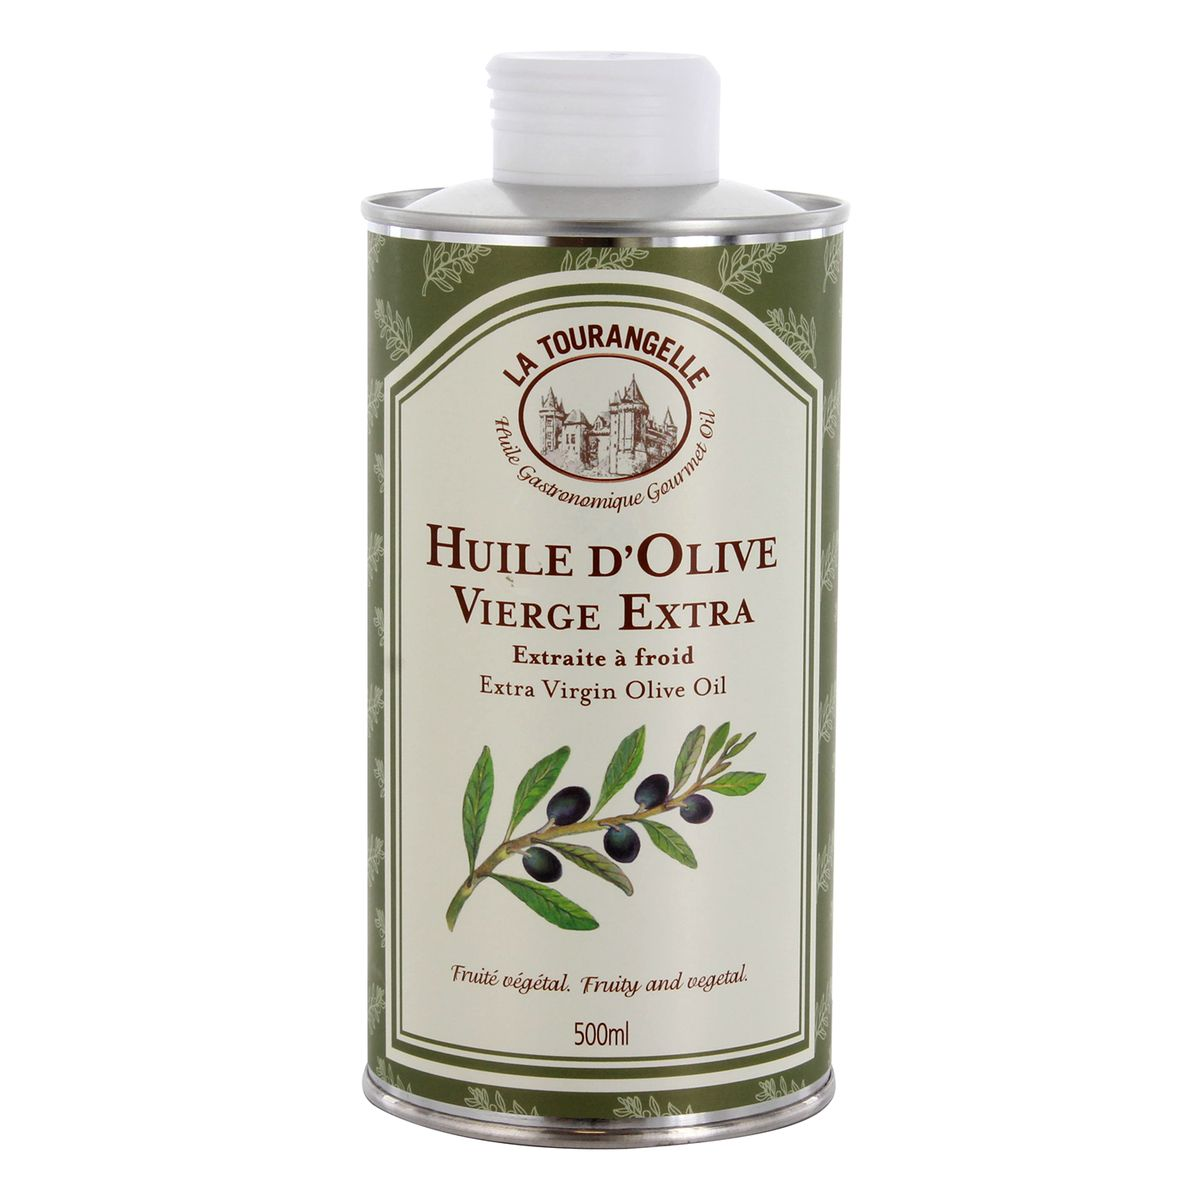 Huile d'Olive Vierge Extra 500 ml - La Tourangelle